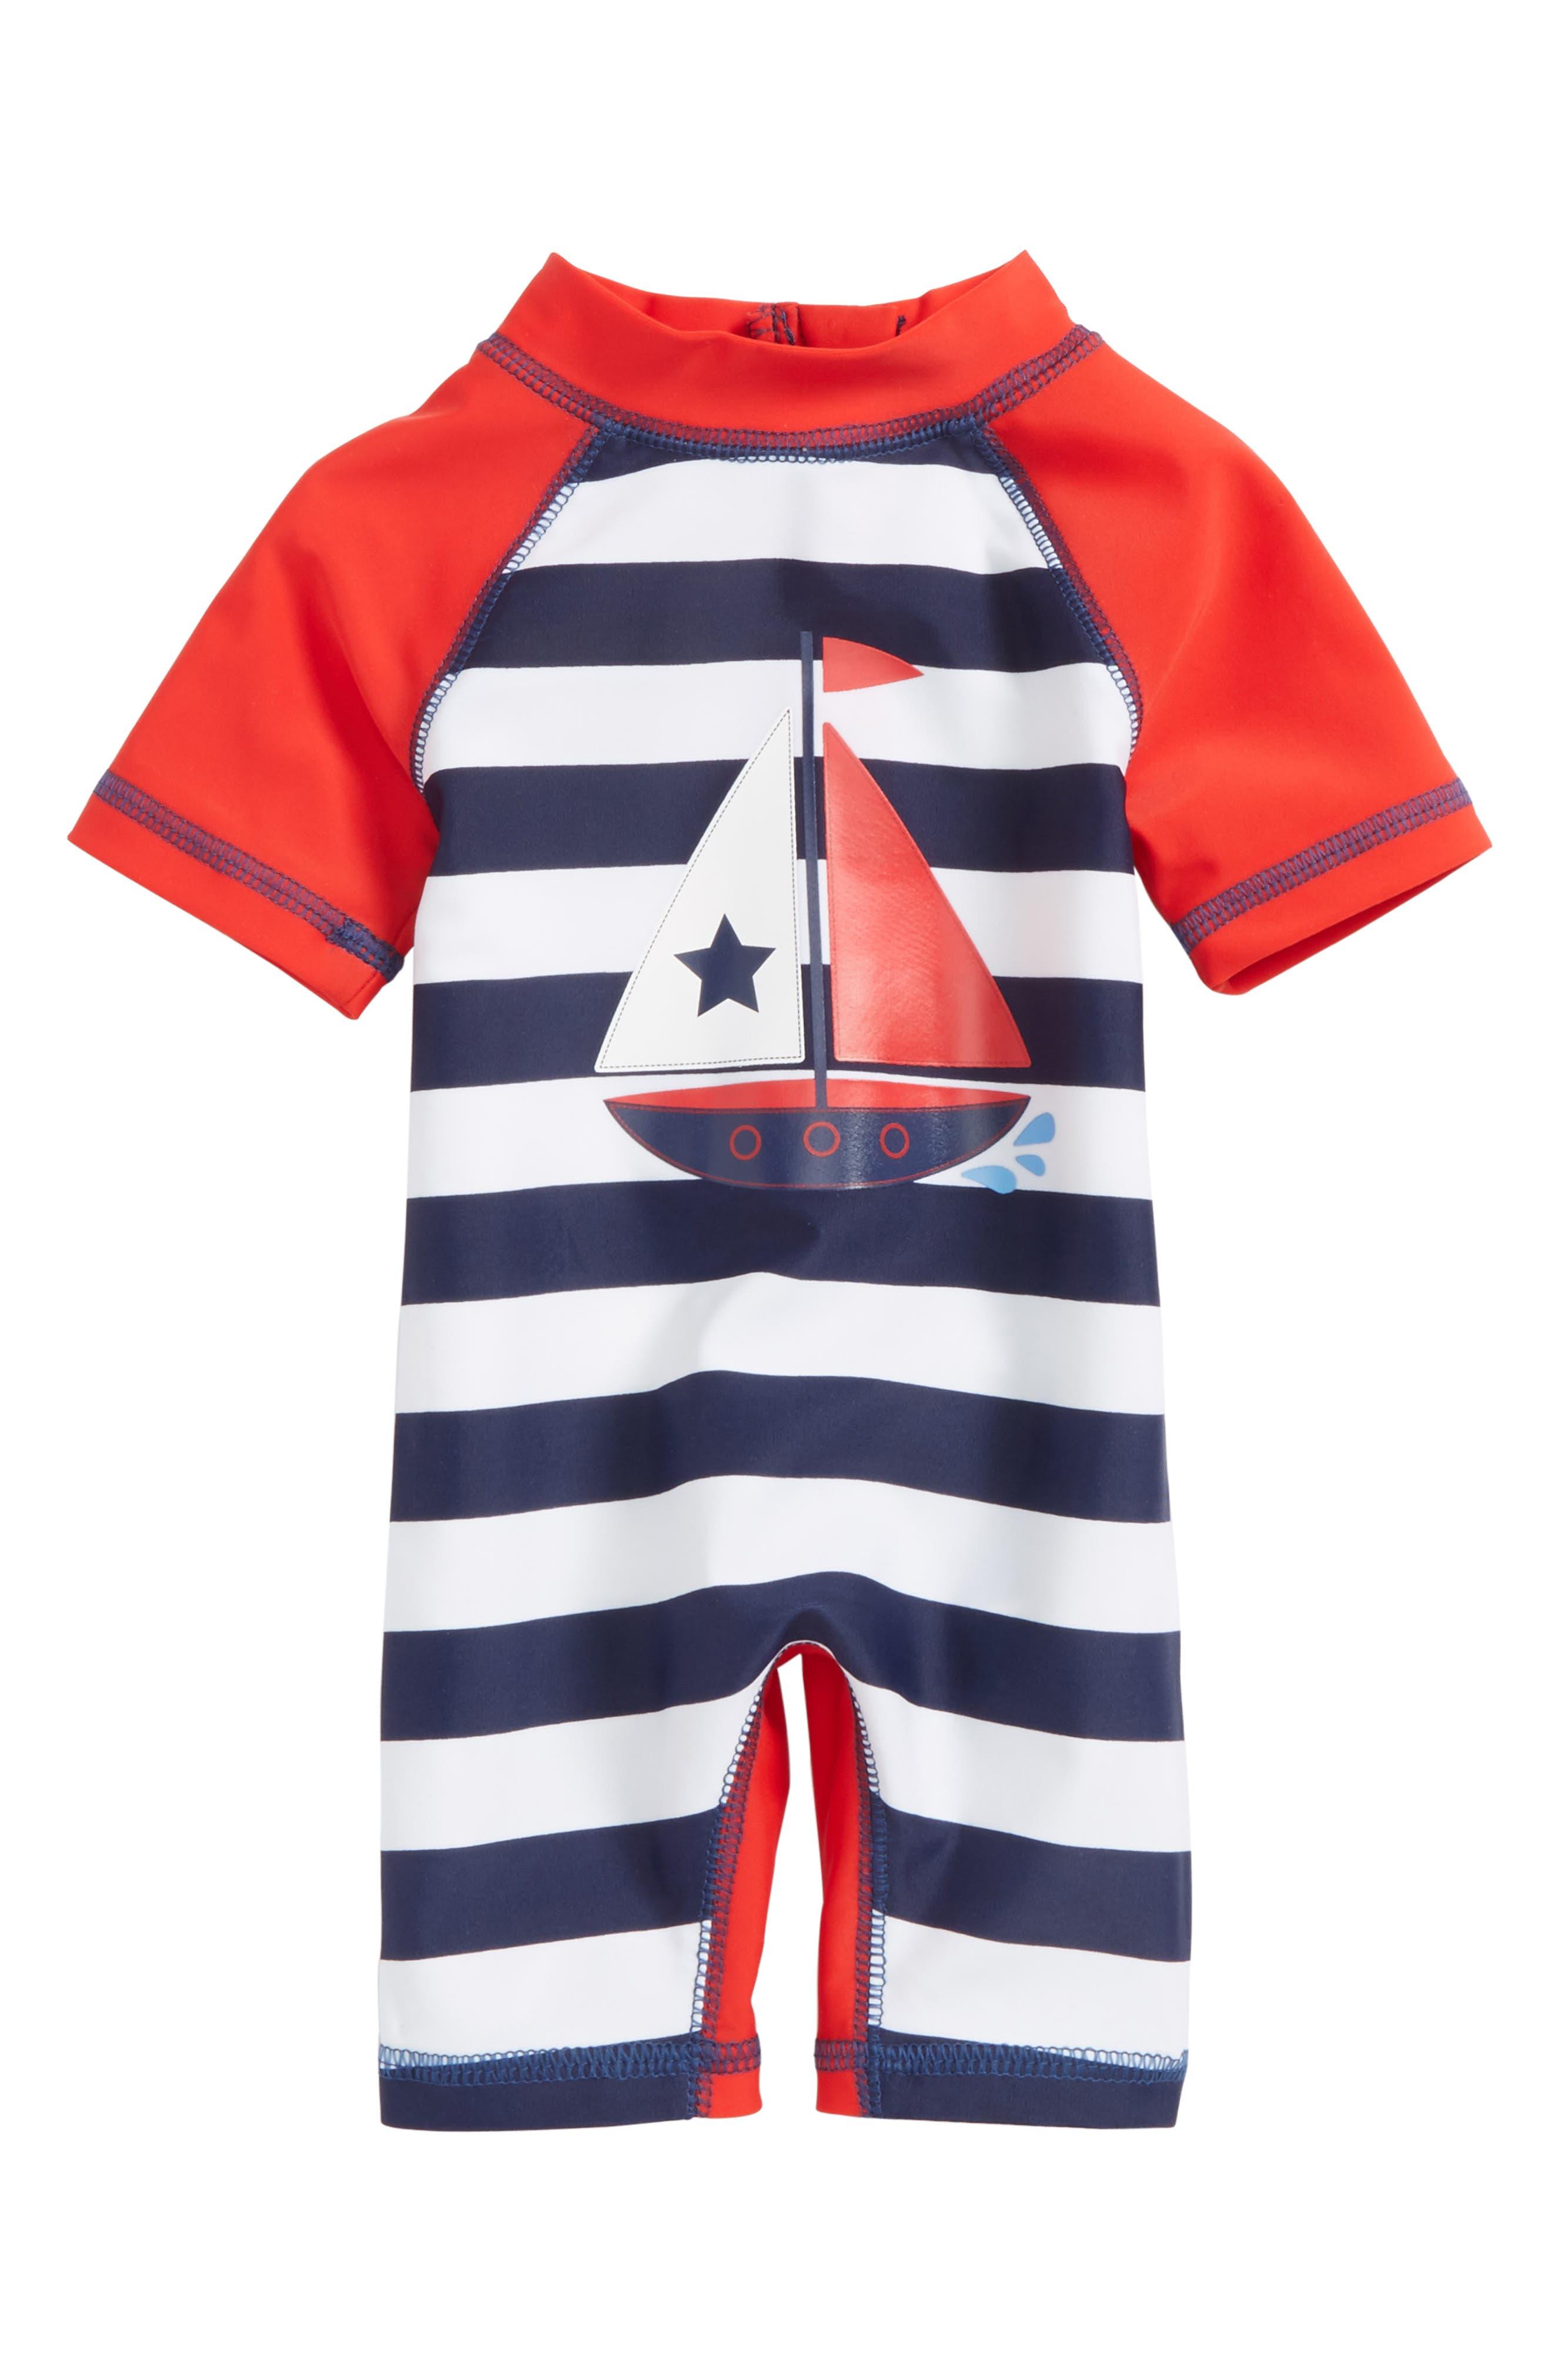 Sailboat UPF 50+ One-Piece Rashguard Swimsuit,                         Main,                         color, 450